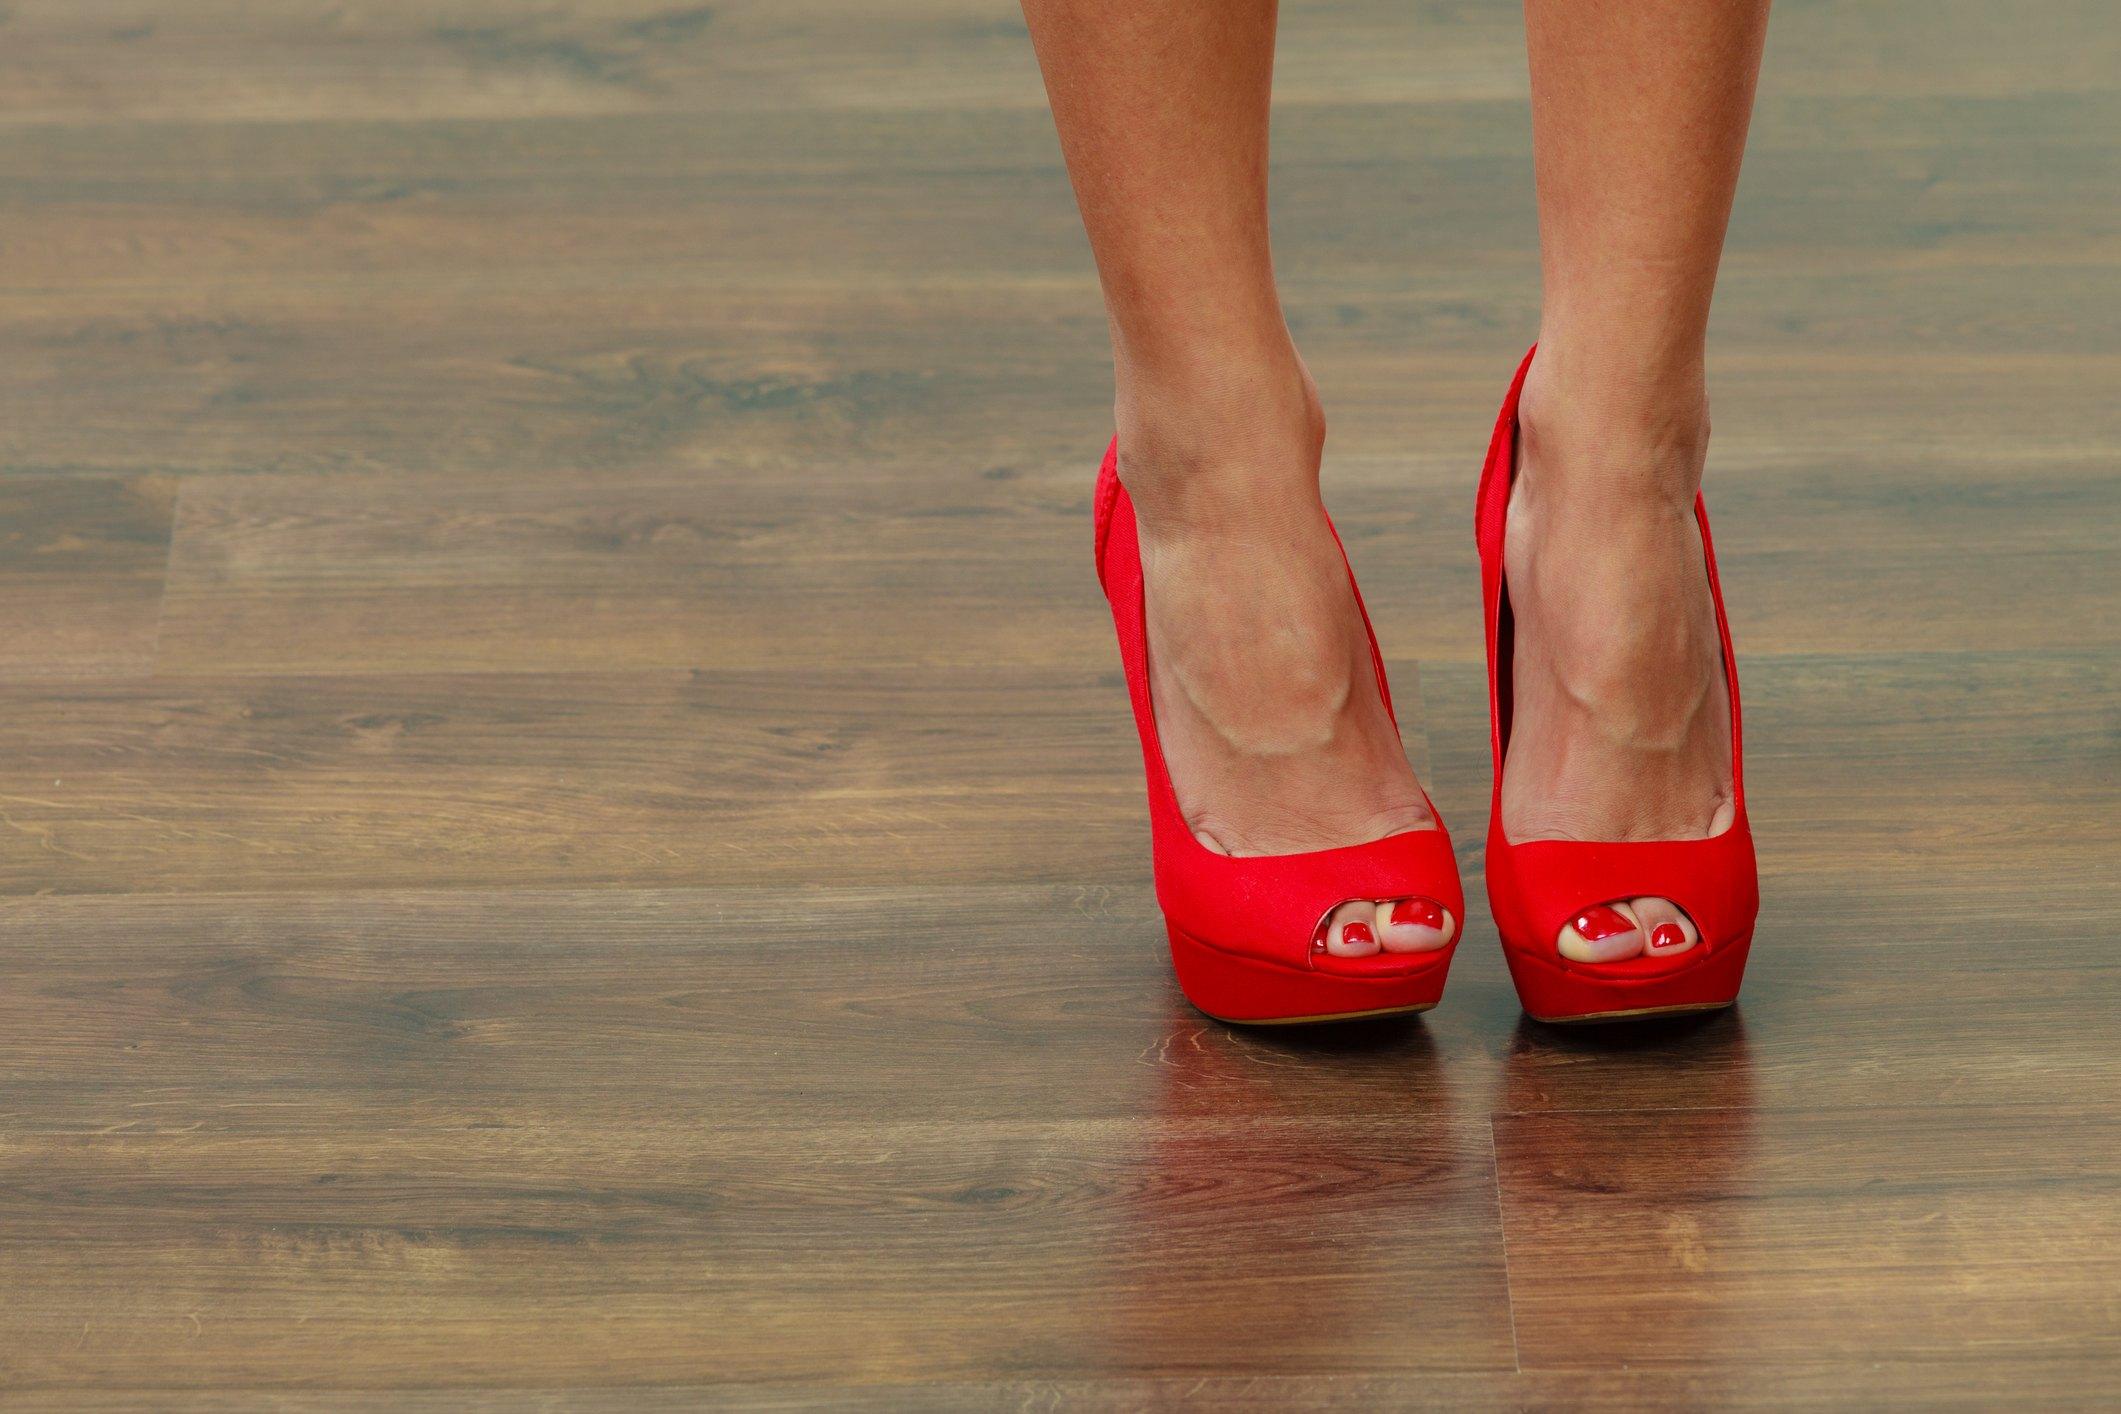 Red high heels on a wood floor